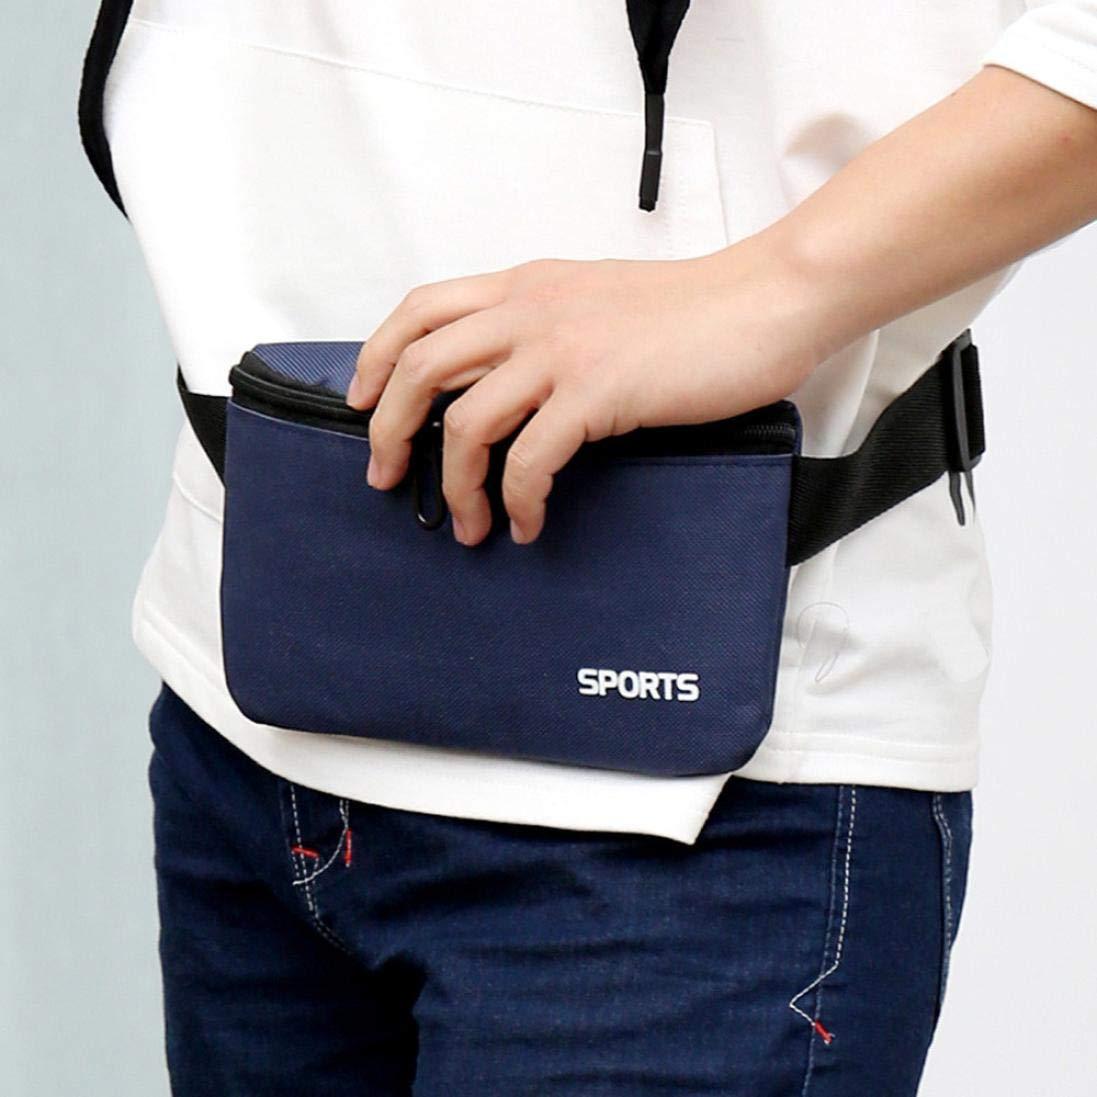 Anxinke Unisex Fashion Waist Packs Phone Bag Outdoor Sport Crossbody Bag Oxford Check Bag Yellow